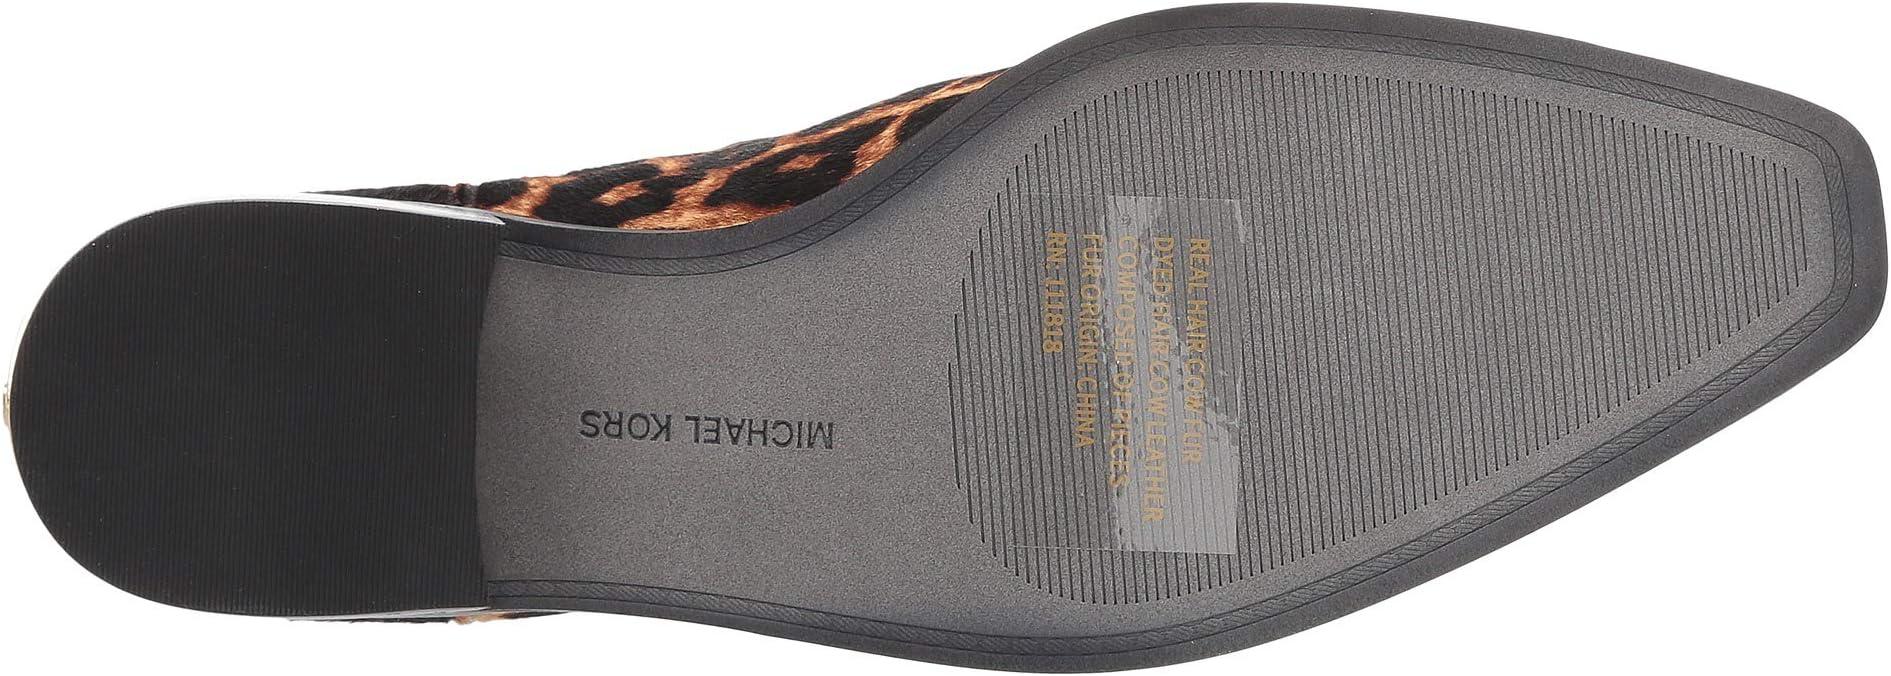 MICHAEL Michael Kors Lottie Flat Bootie | Women's shoes | 2020 Newest